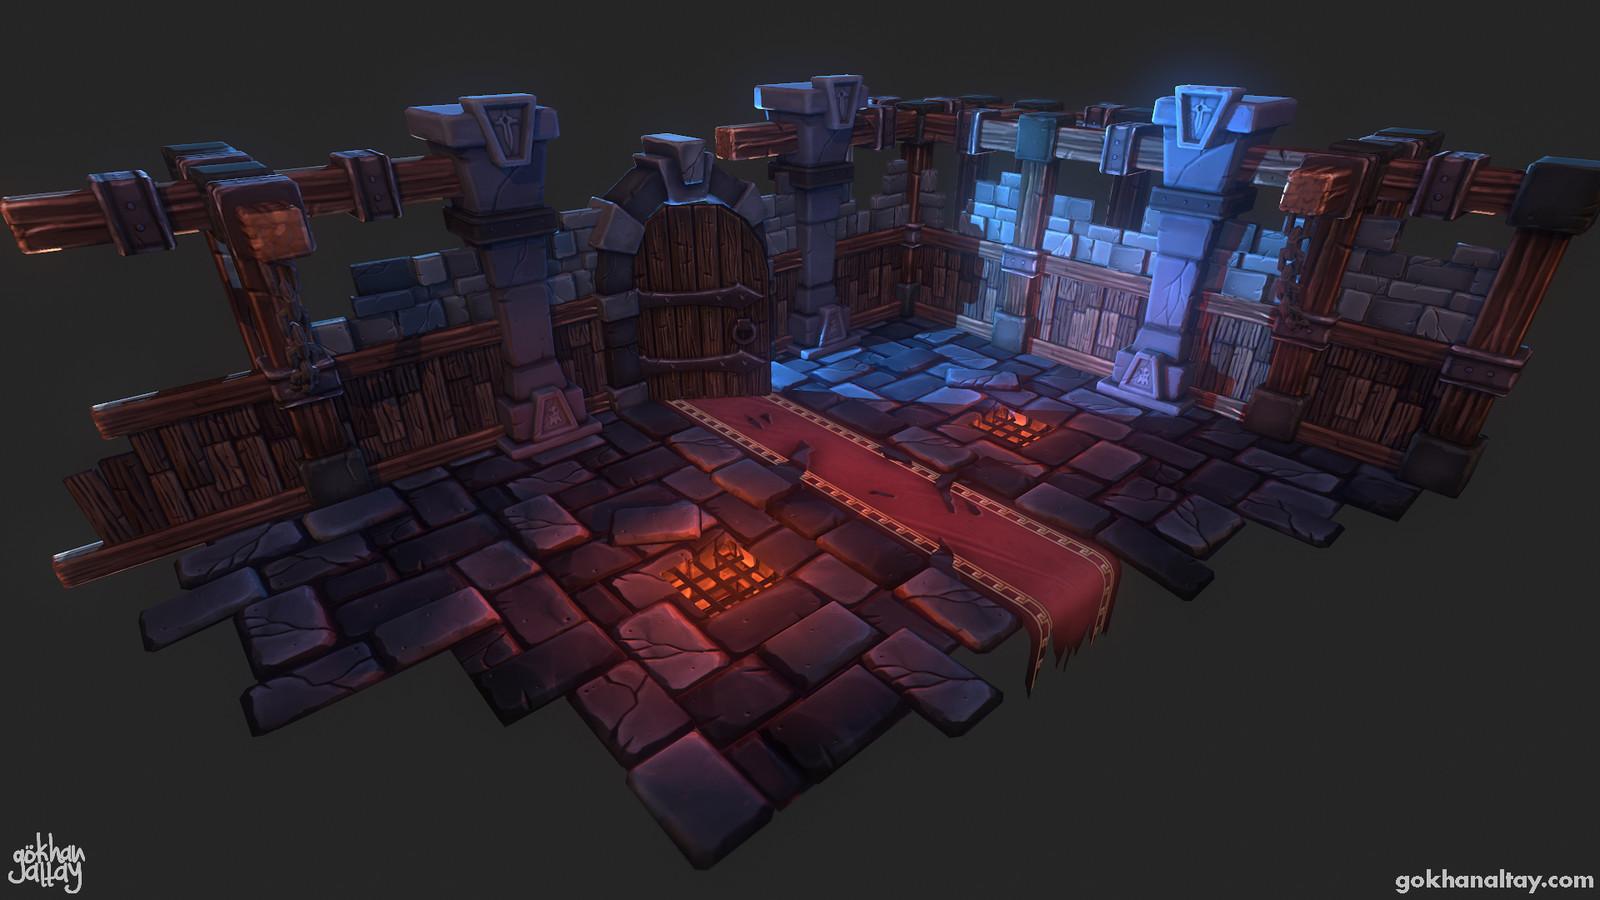 Stylized Dungeon Scene